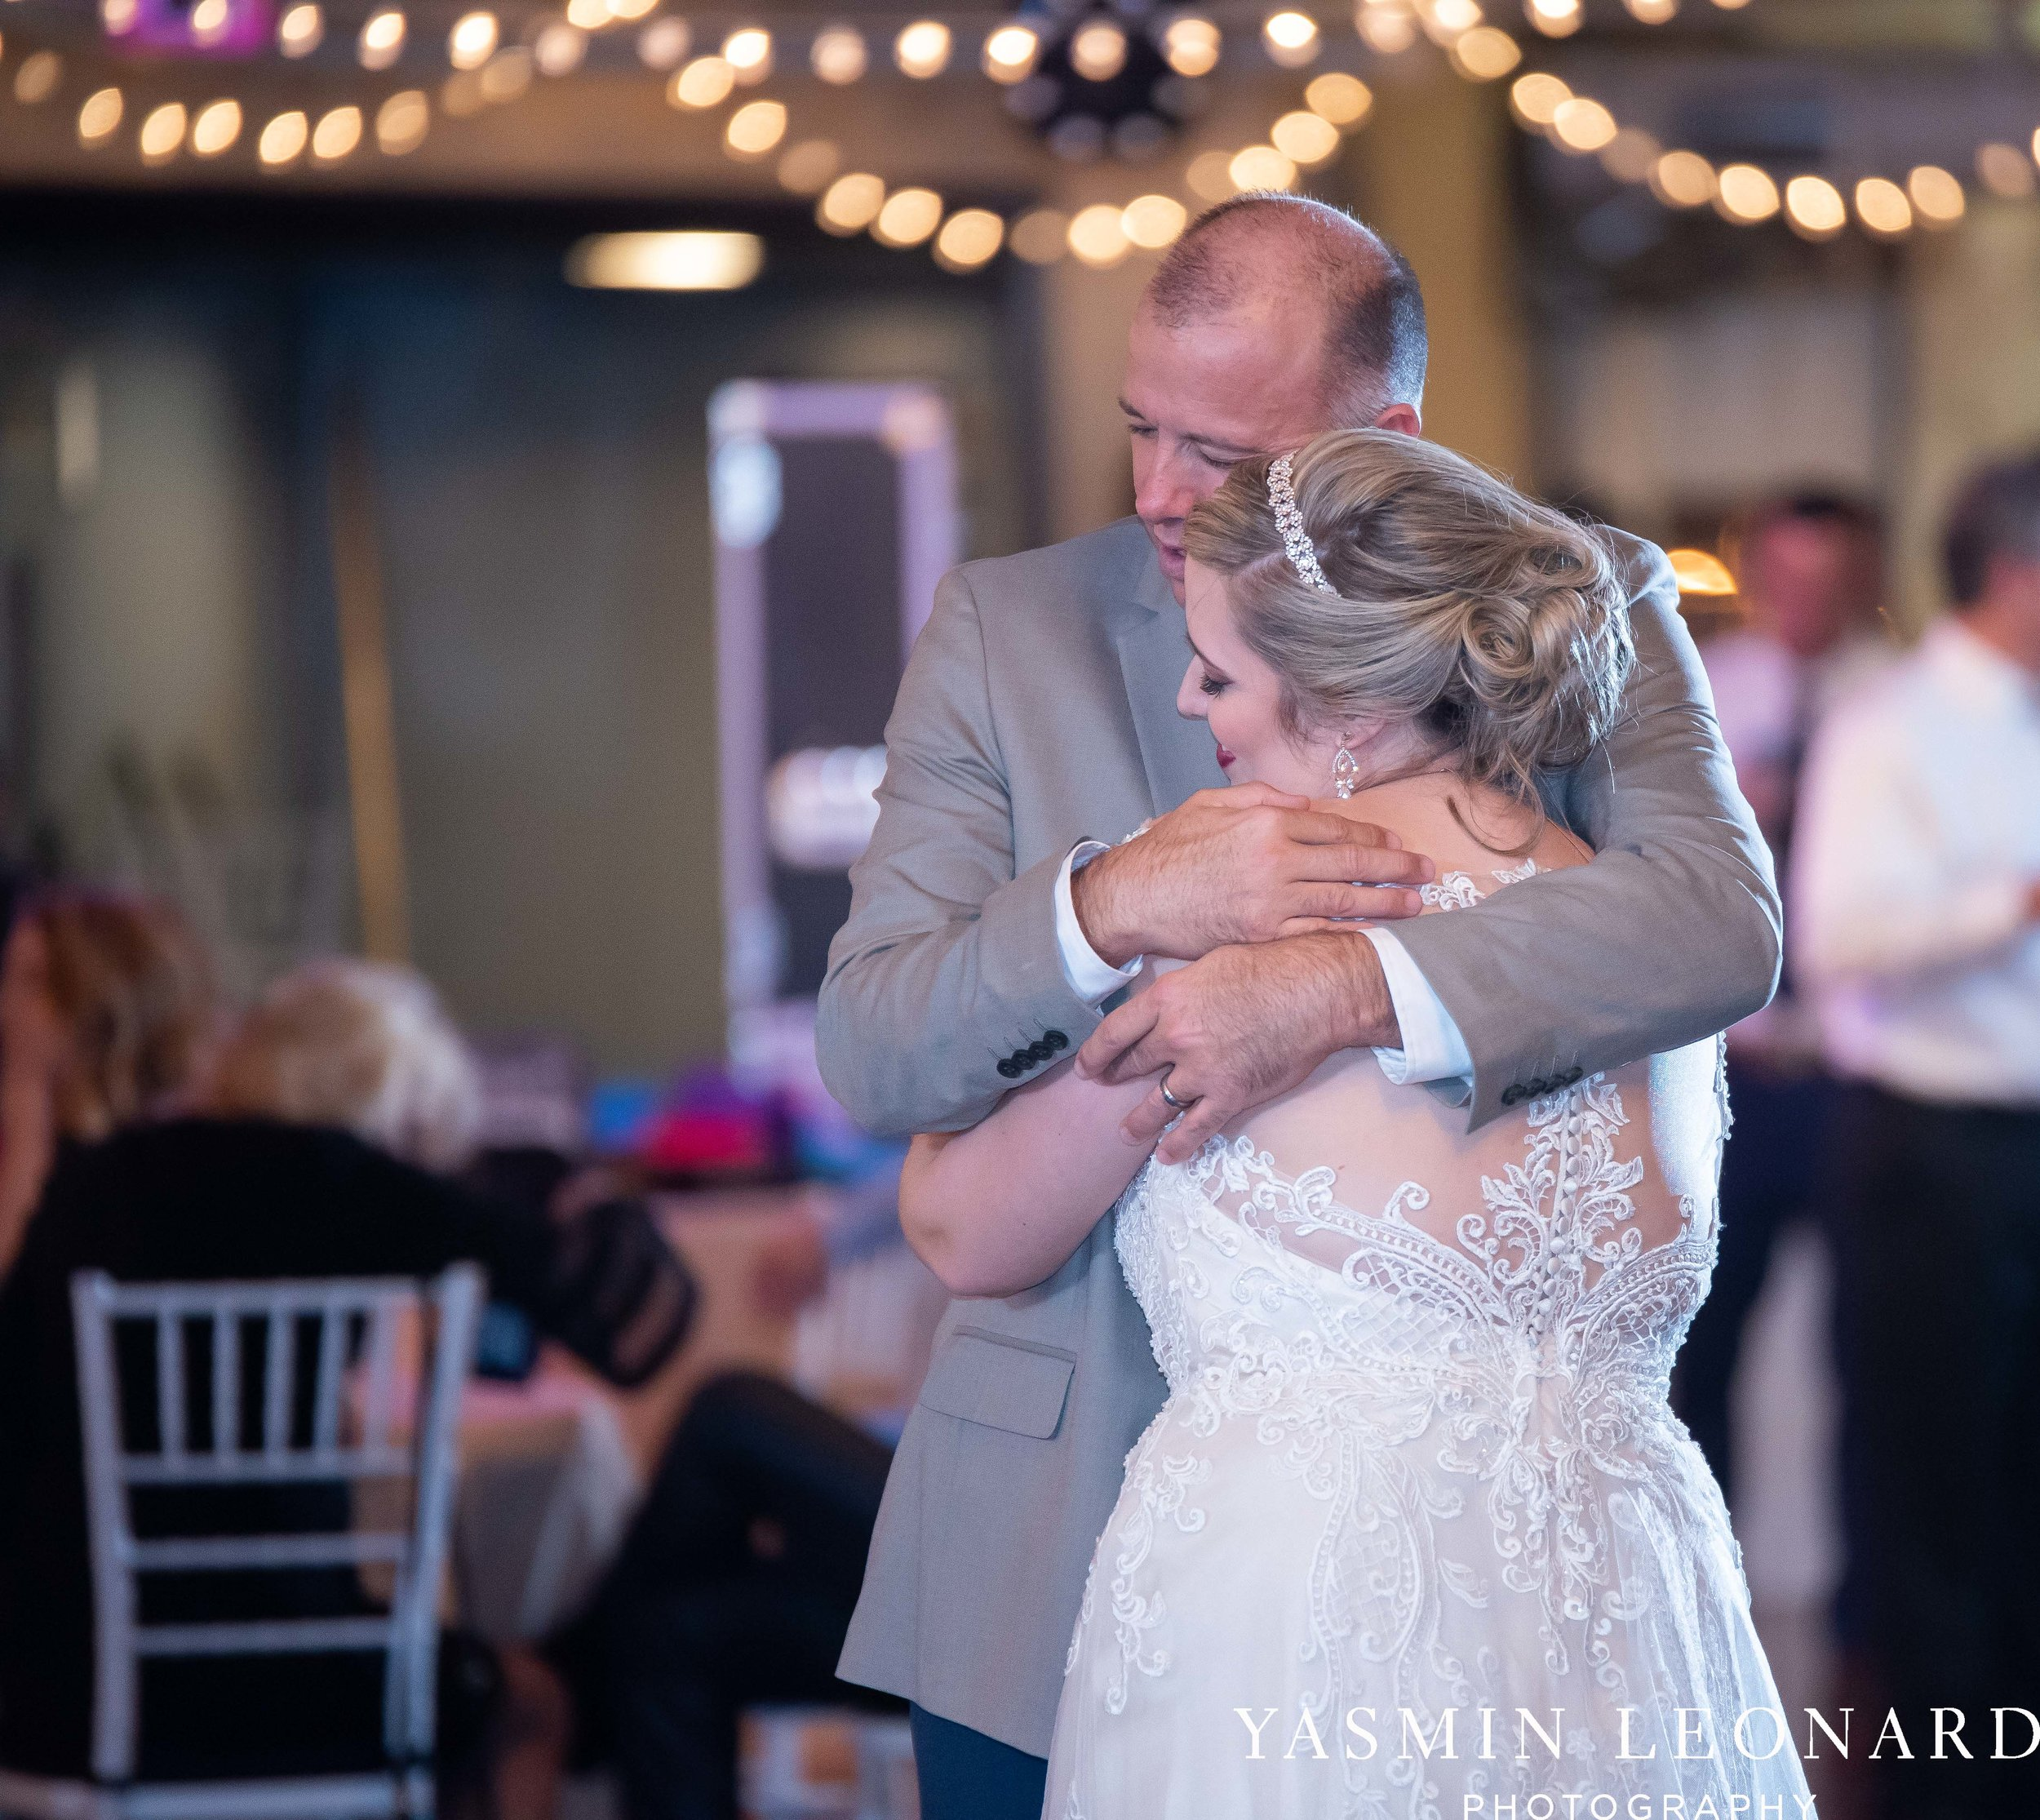 Rebekah and Matt - 105 Worth Event Centre - Yasmin Leonard Photography - Asheboro Wedding - NC Wedding - High Point Weddings - Triad Weddings - Winter Wedding-52.jpg